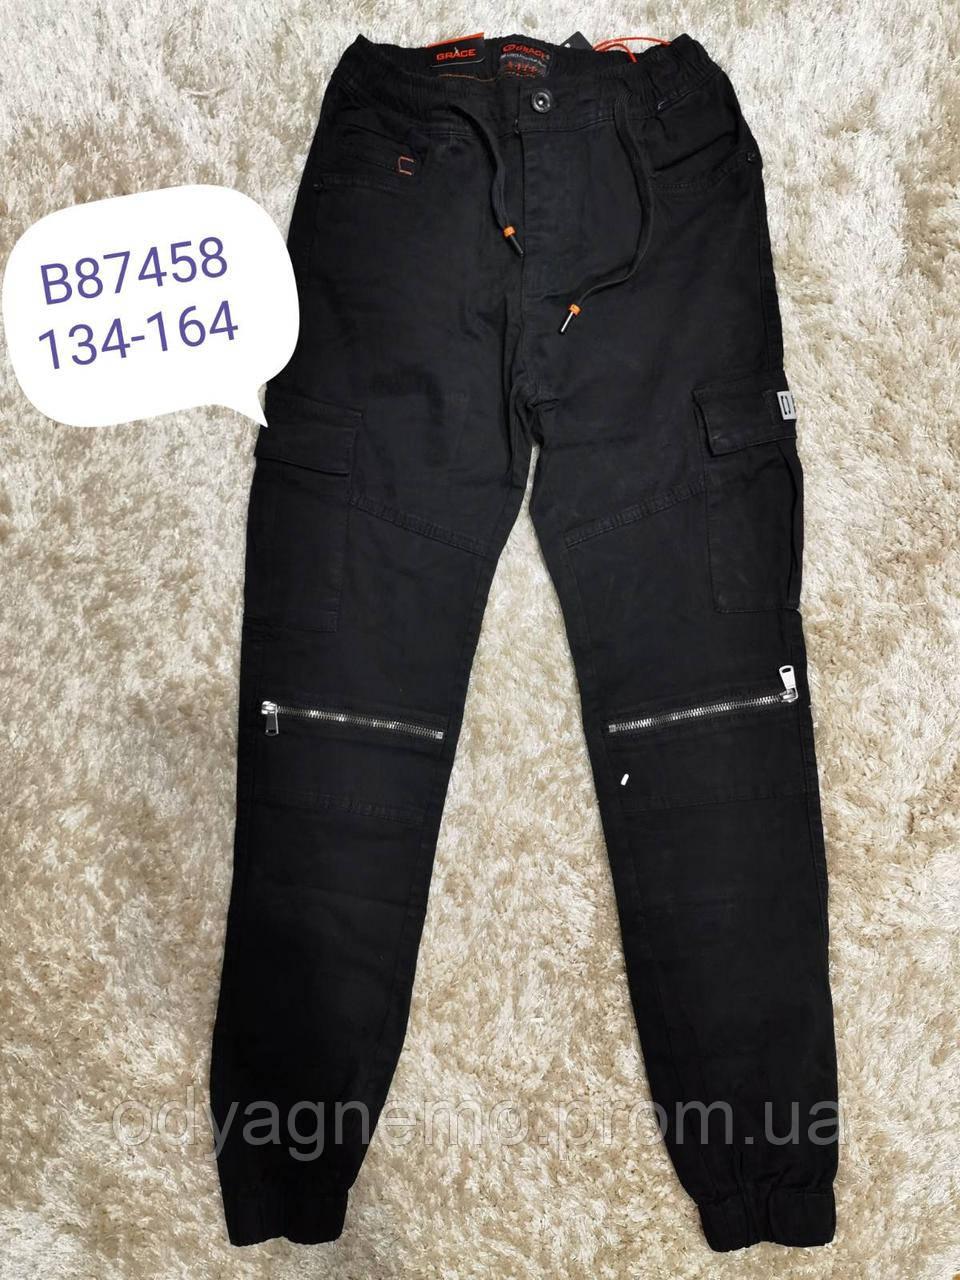 Котоновые брюки  для мальчиков Grace , Артикул B87458 ,134-164 рр.